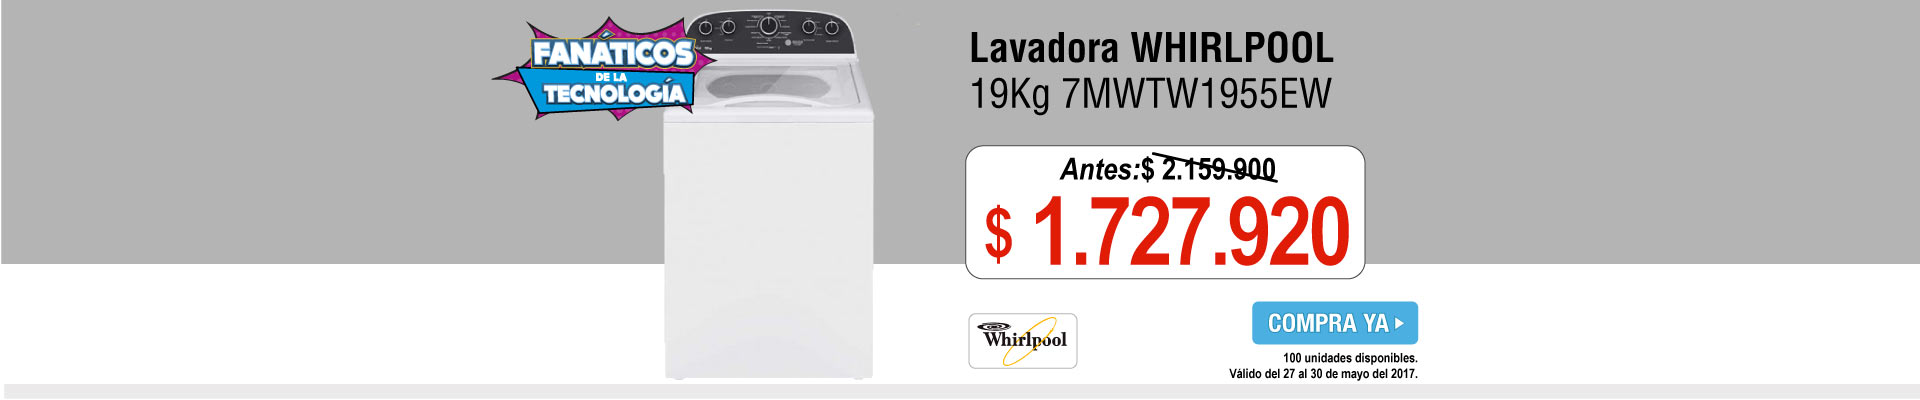 Lavadora WHIRLPOOL 19Kg 7MWTW1955EW - banner principal